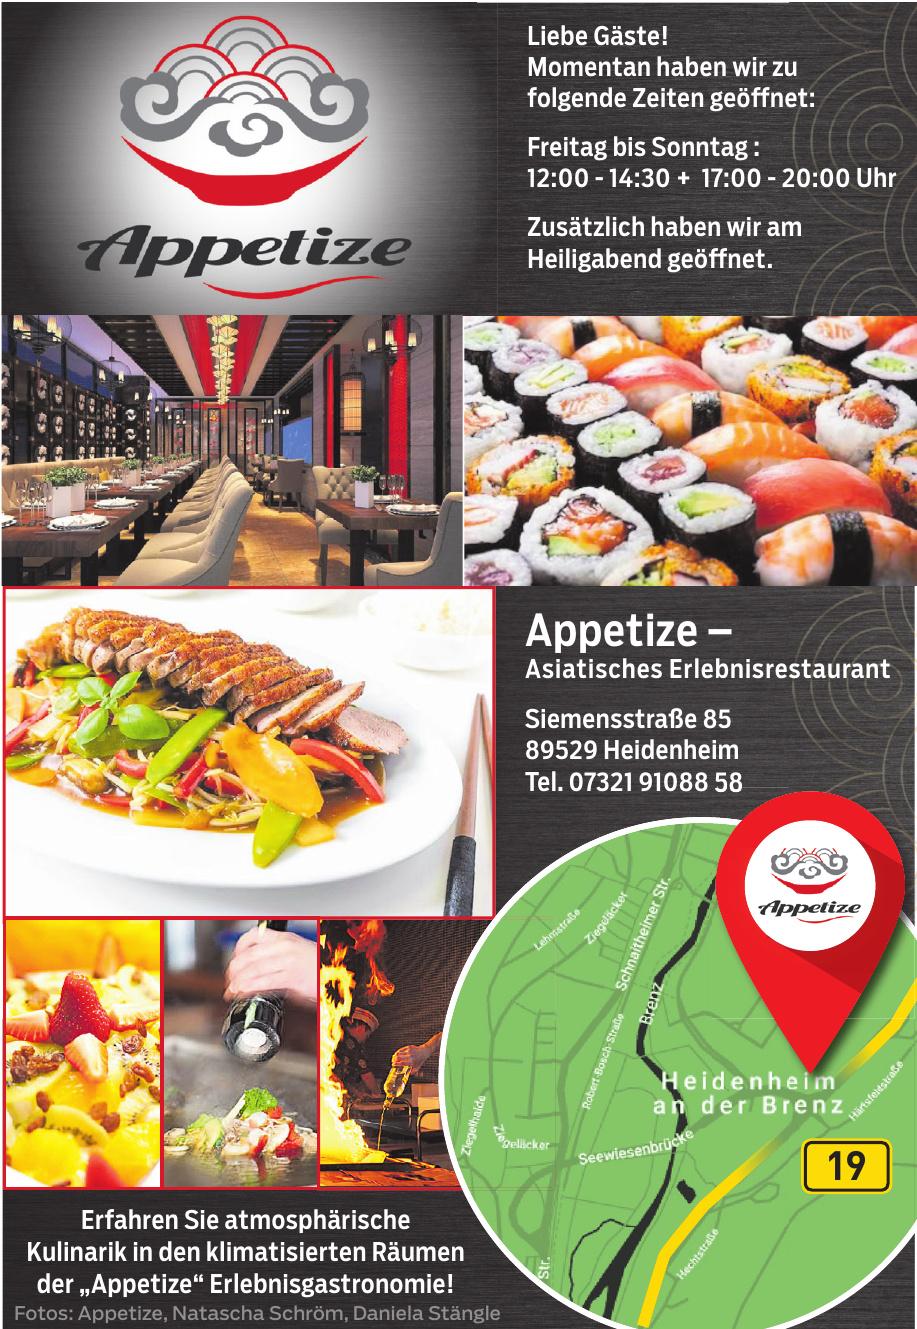 Appetize - Asiatisches Erlebnisrestaurant